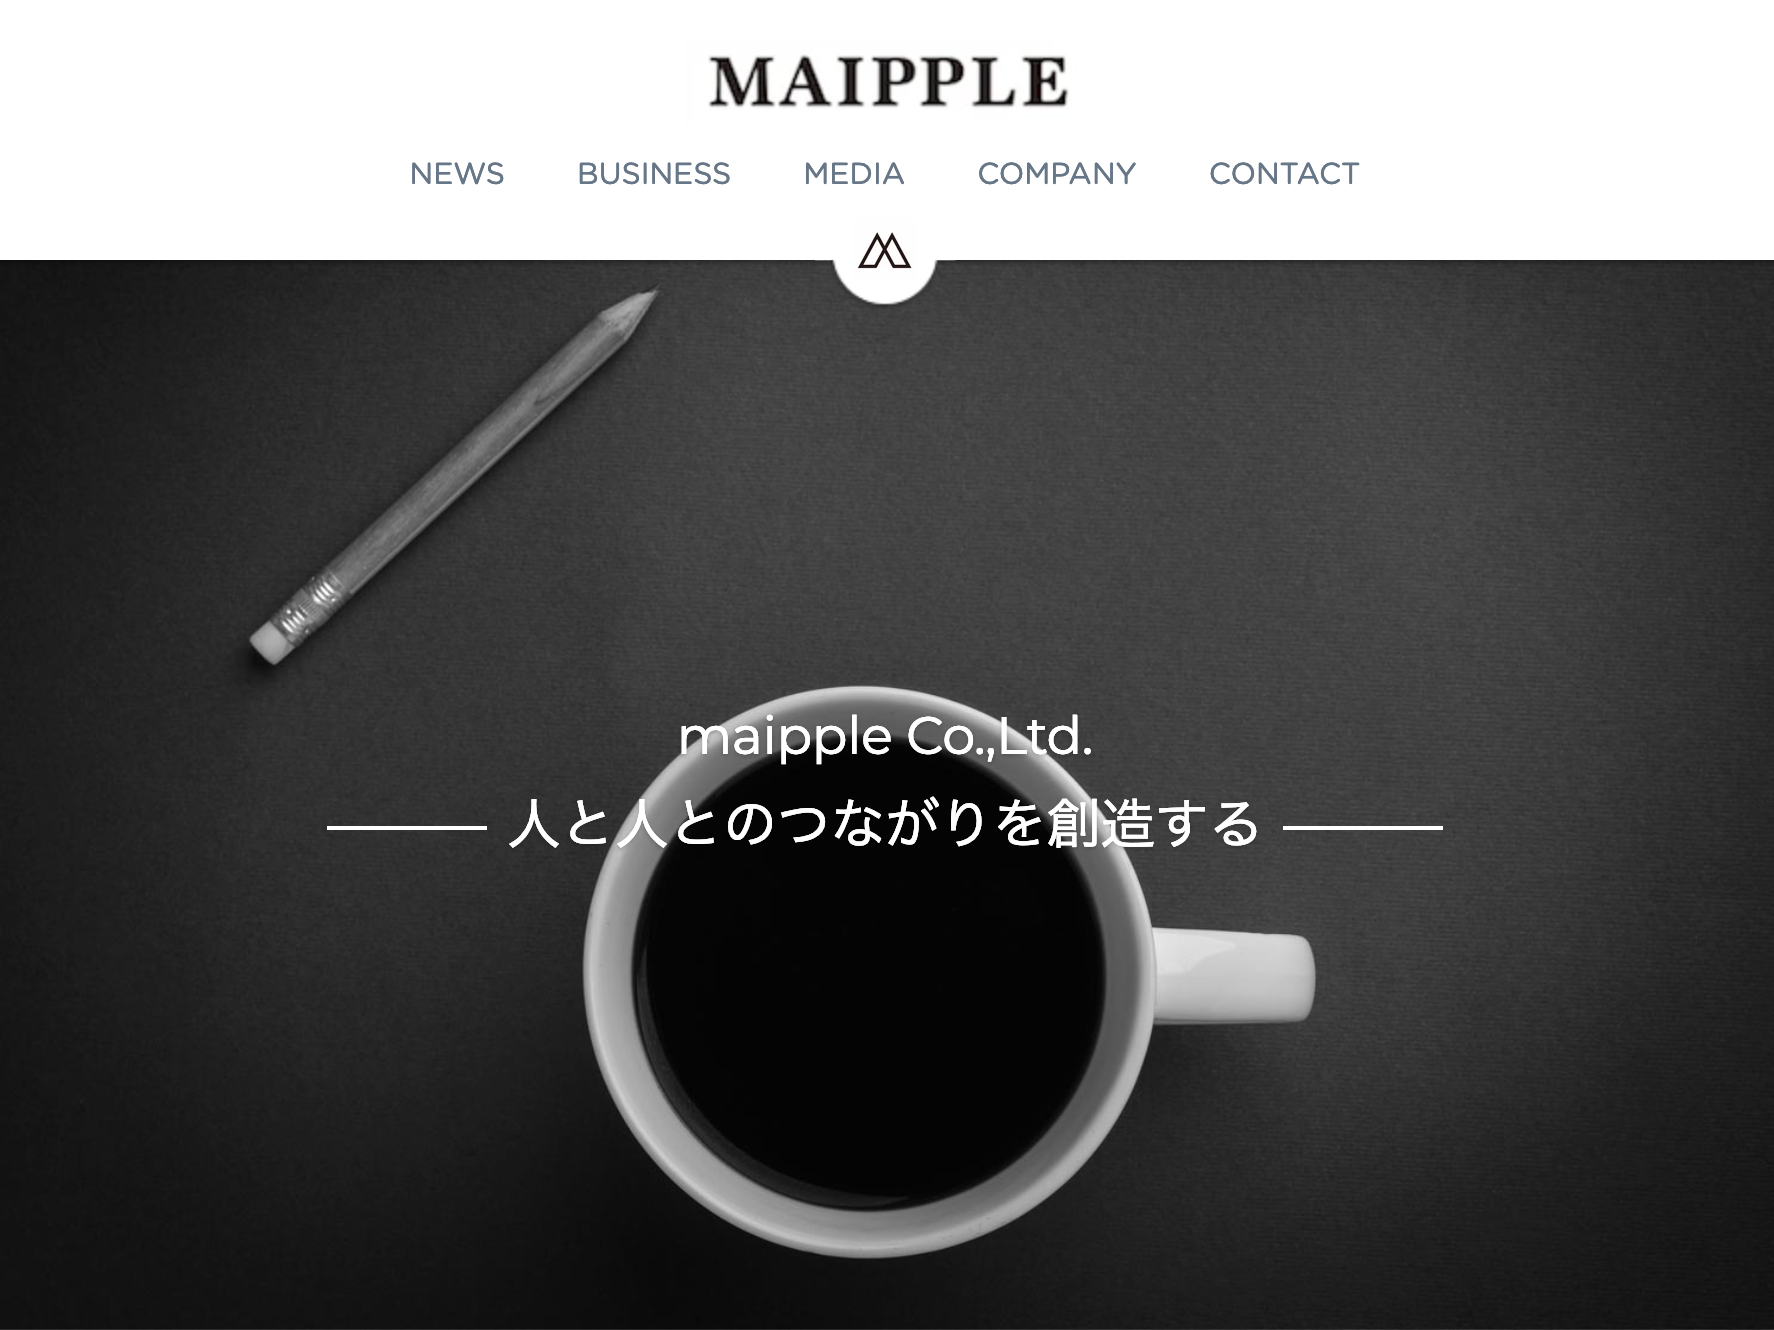 maipple